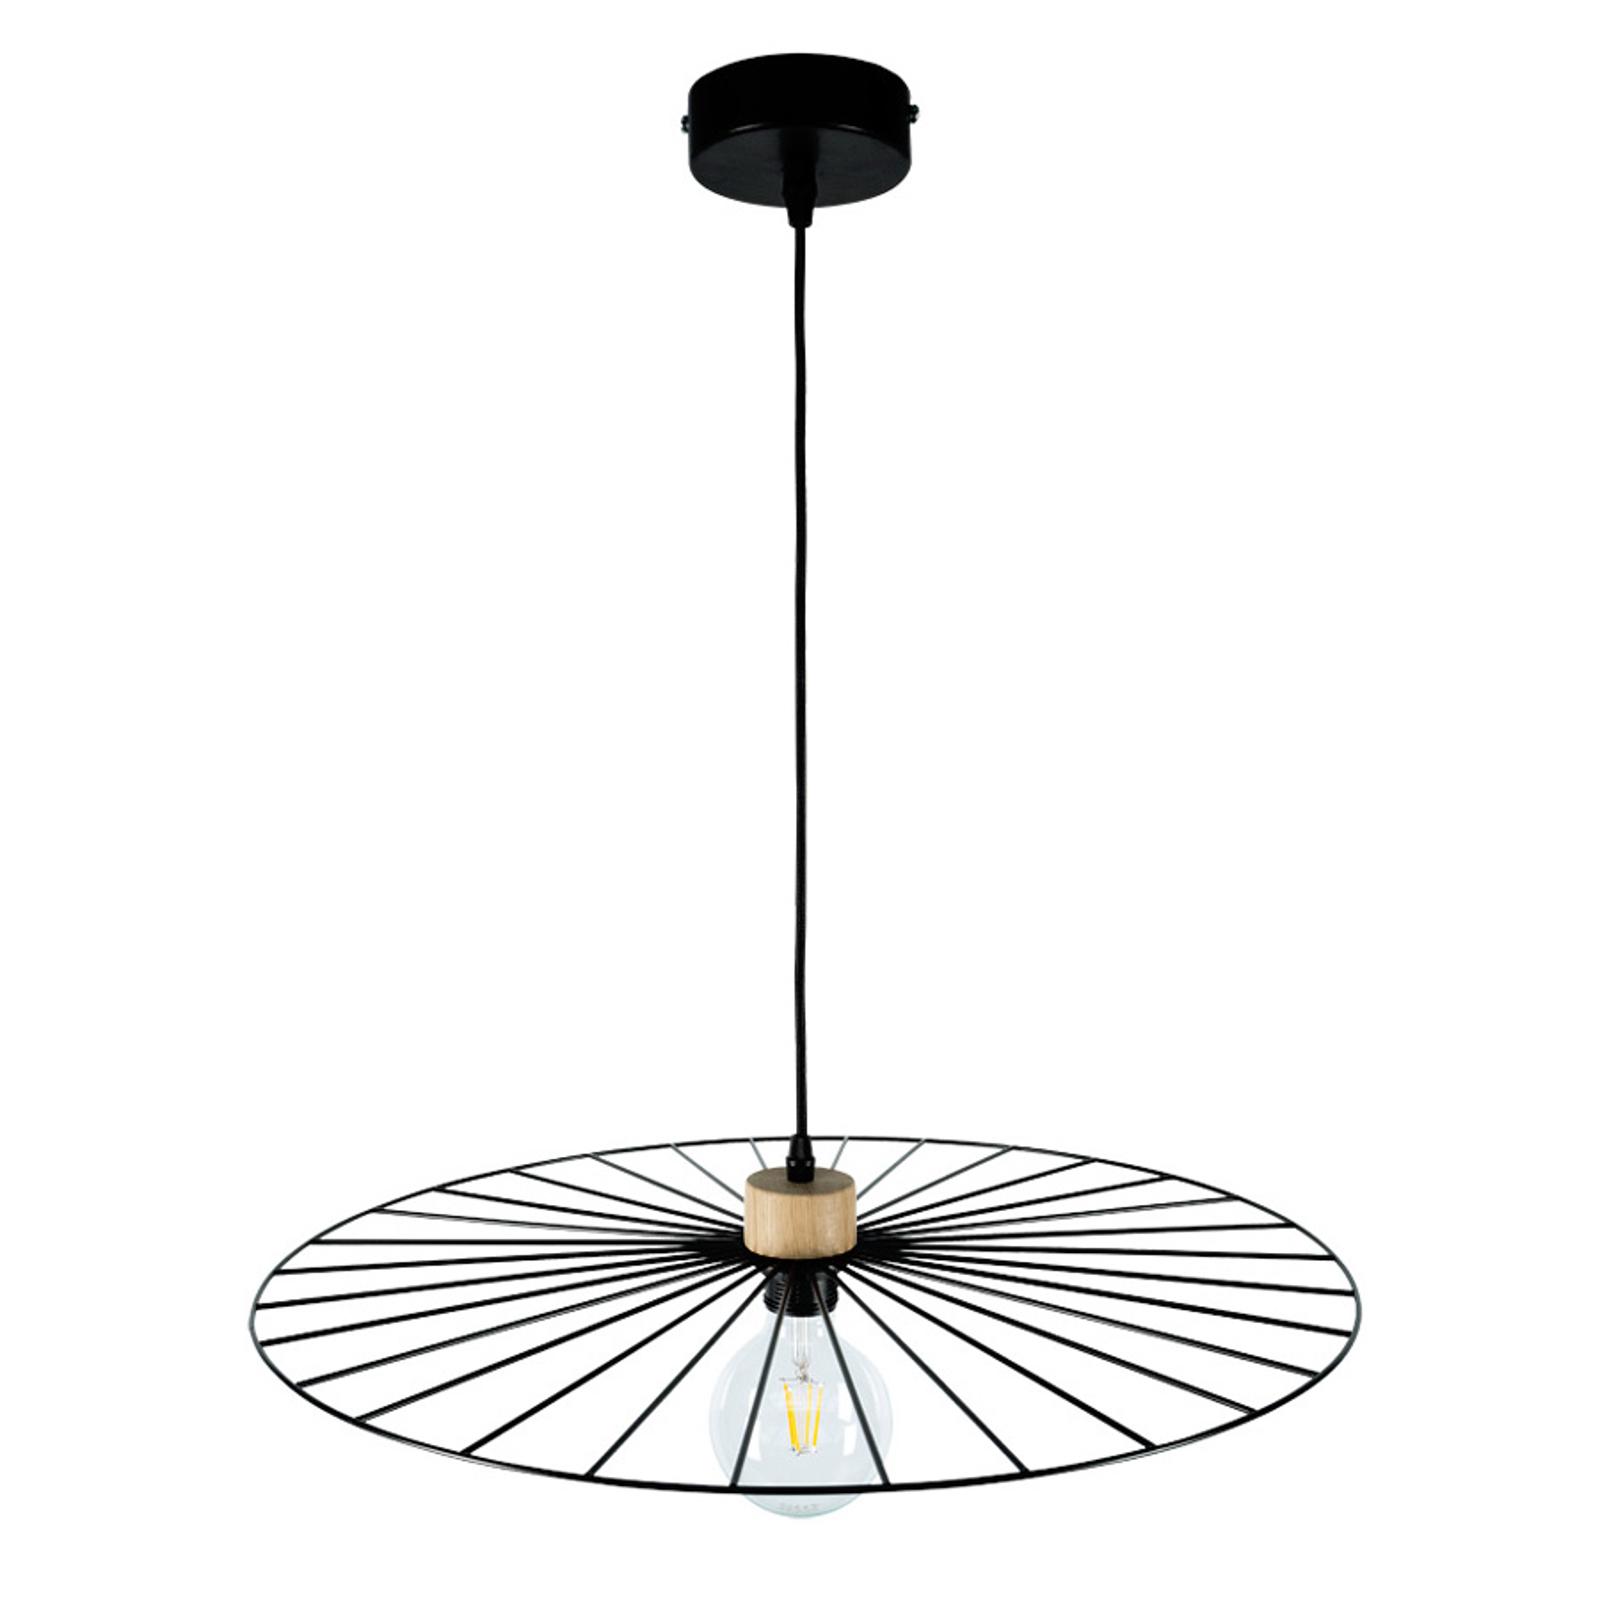 Lampa wisząca Antonella czarna, detal drewno Ø65cm